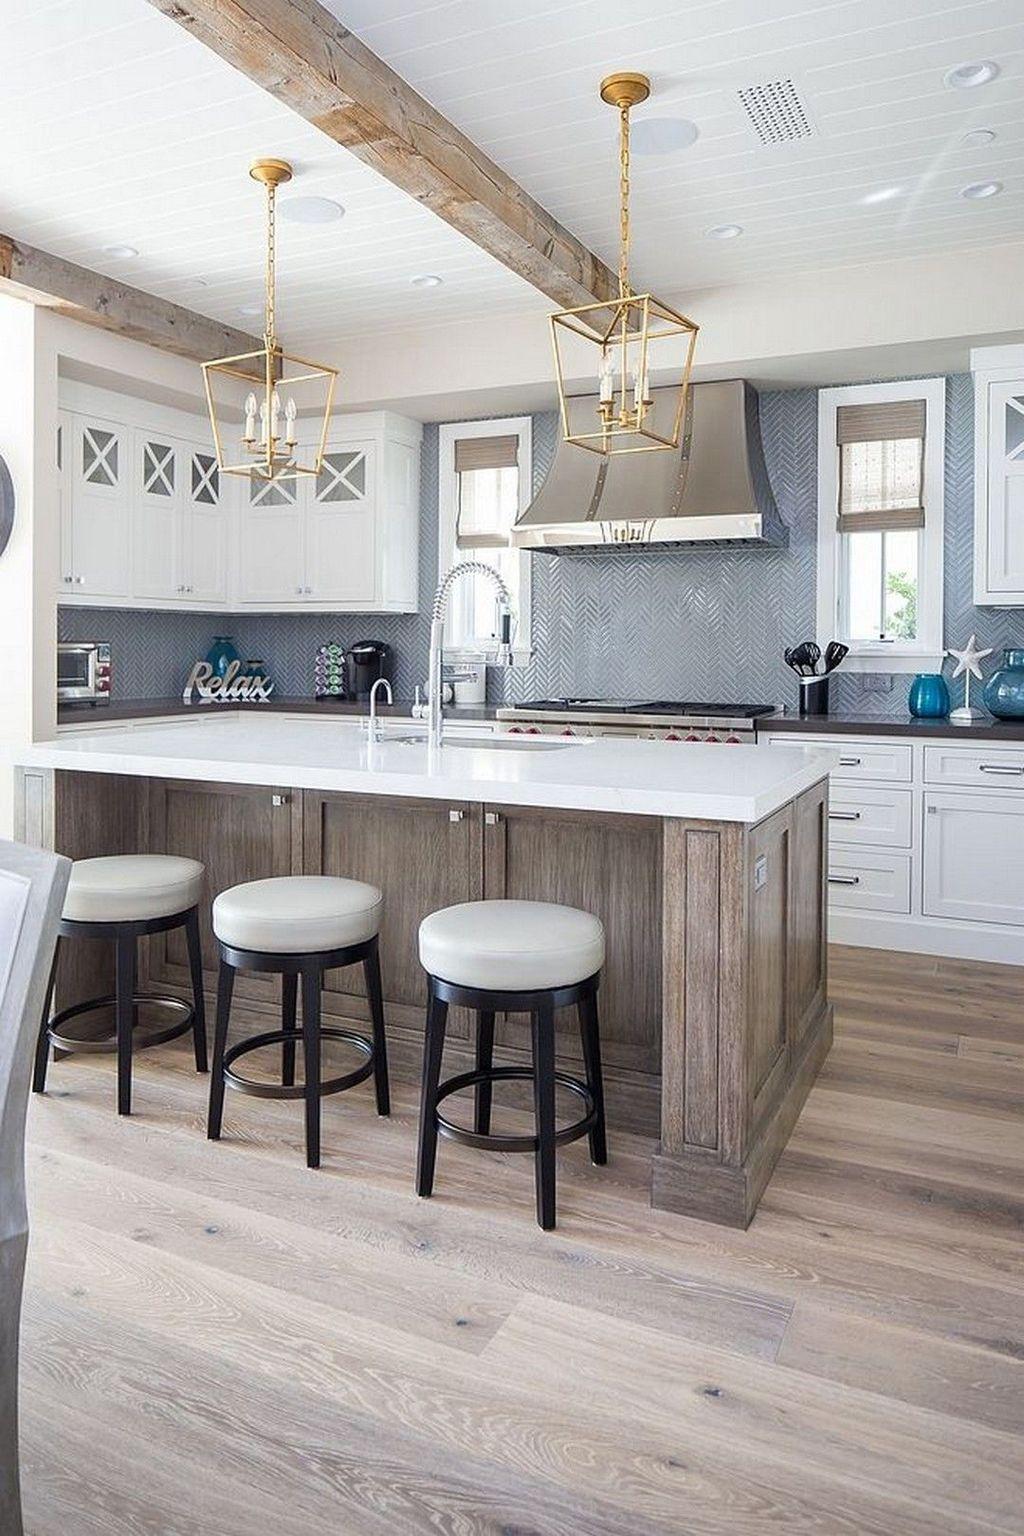 30 creative coastal backsplash design ideas for kitchen